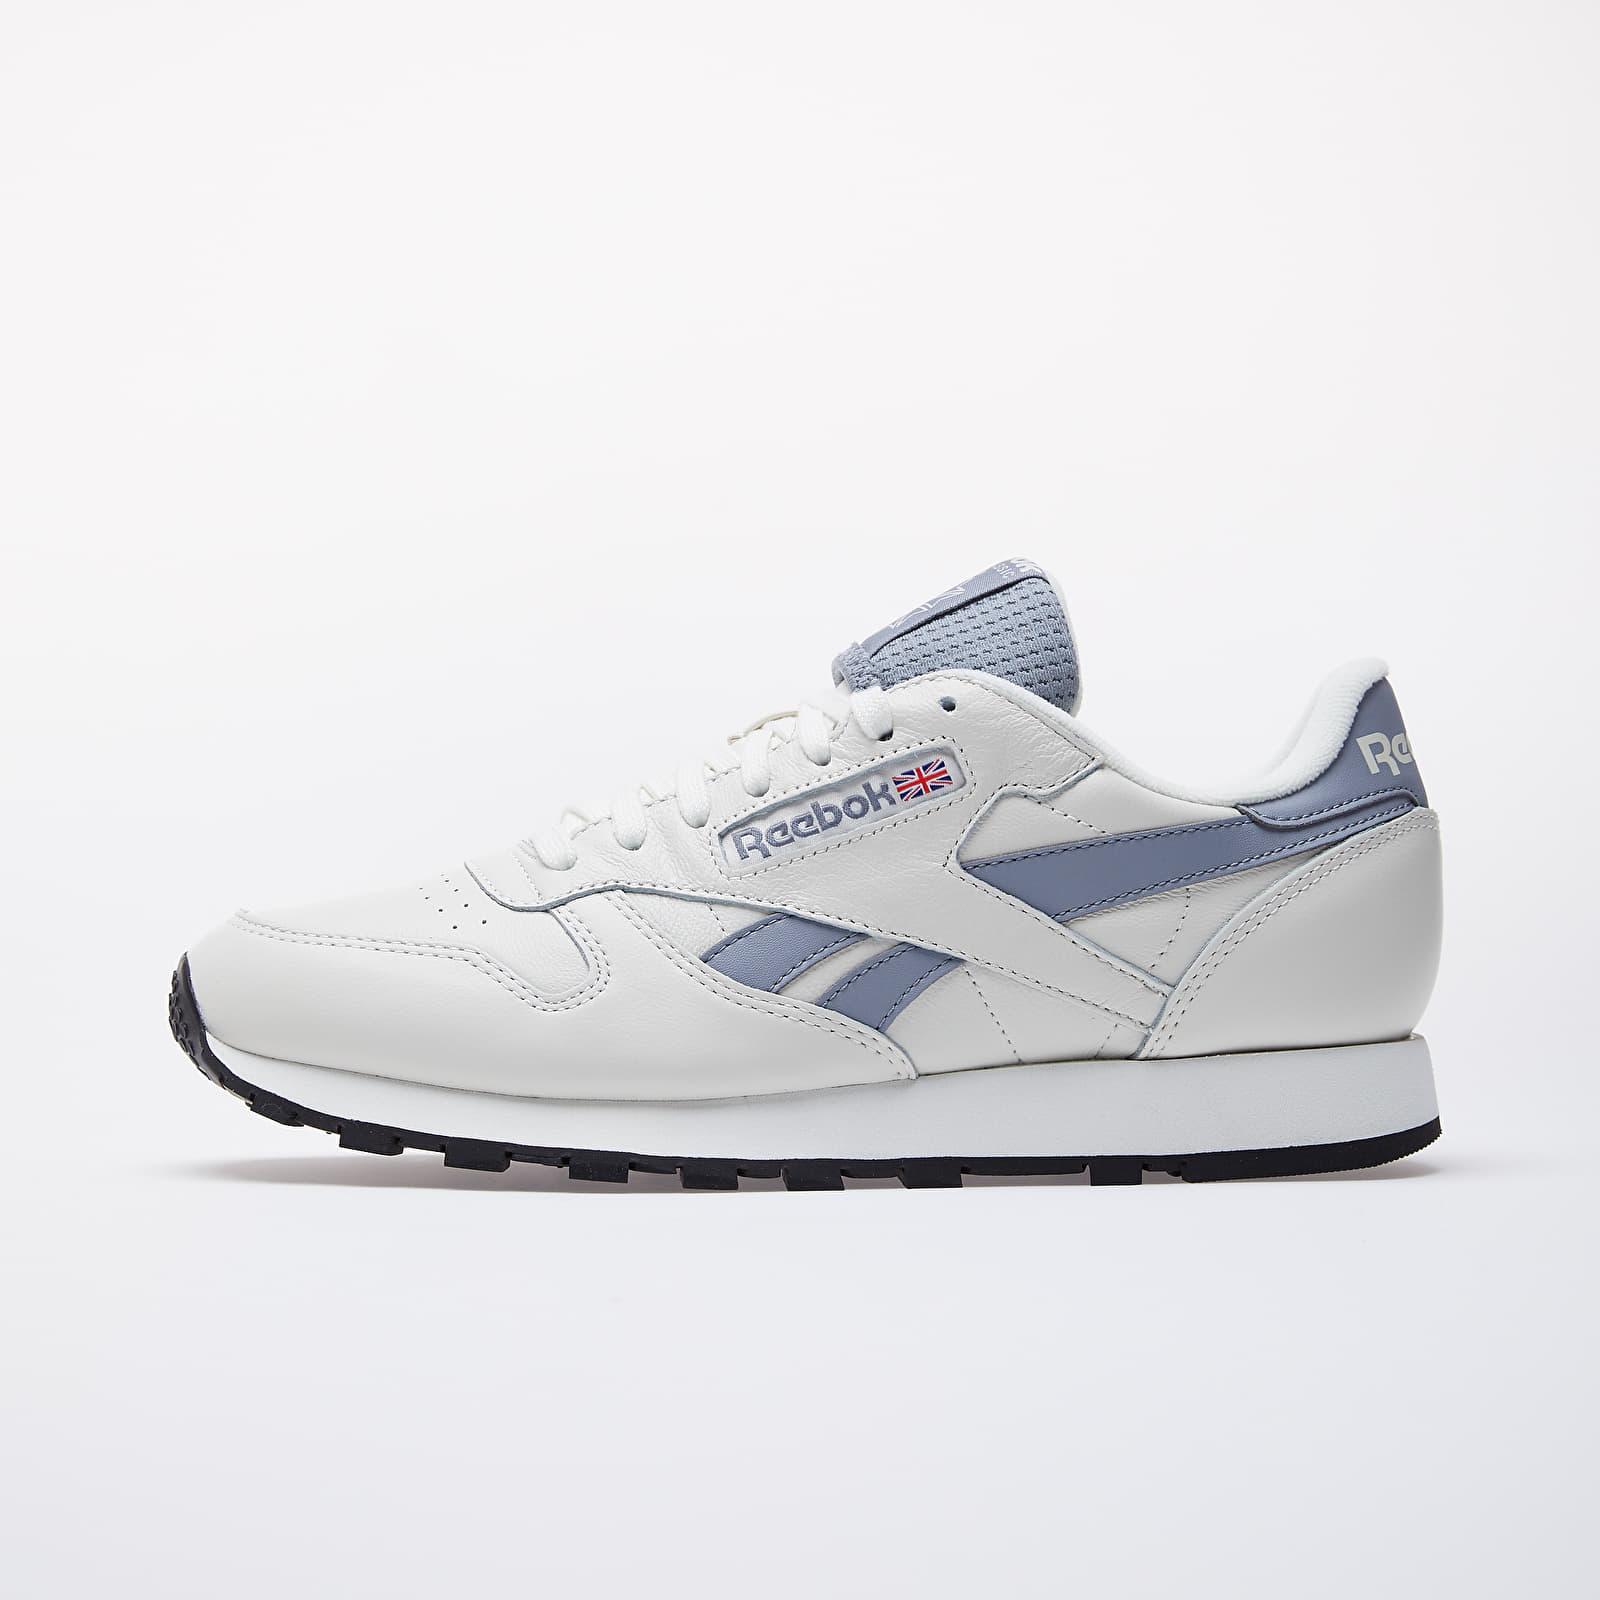 Men's shoes Reebok Classic Leather MU Chalk/ Cdgry4/ Black